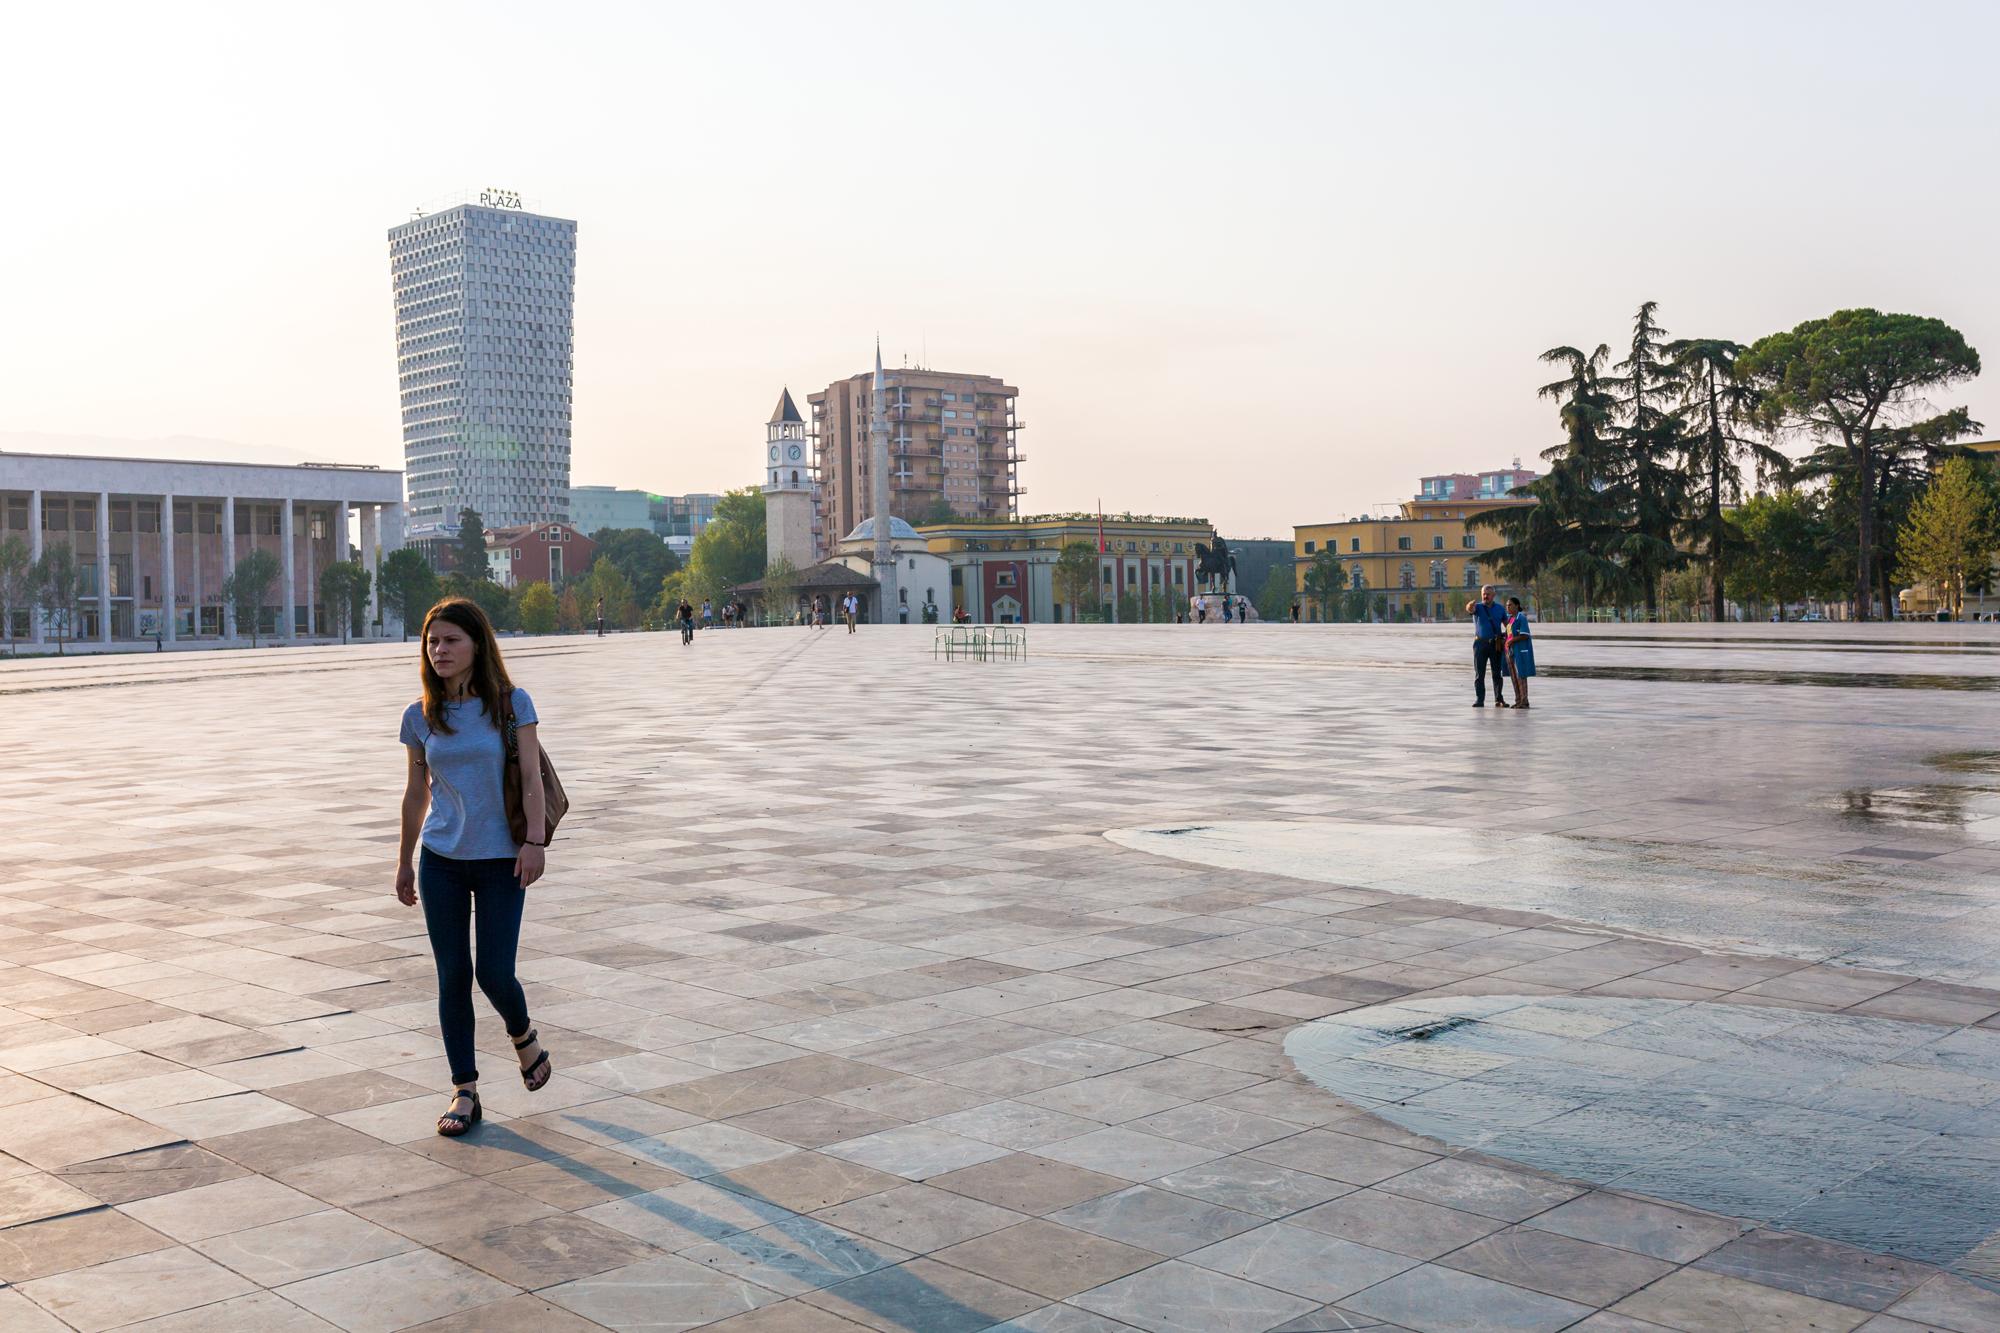 A girl walking across the main square in Tirana, Albania.